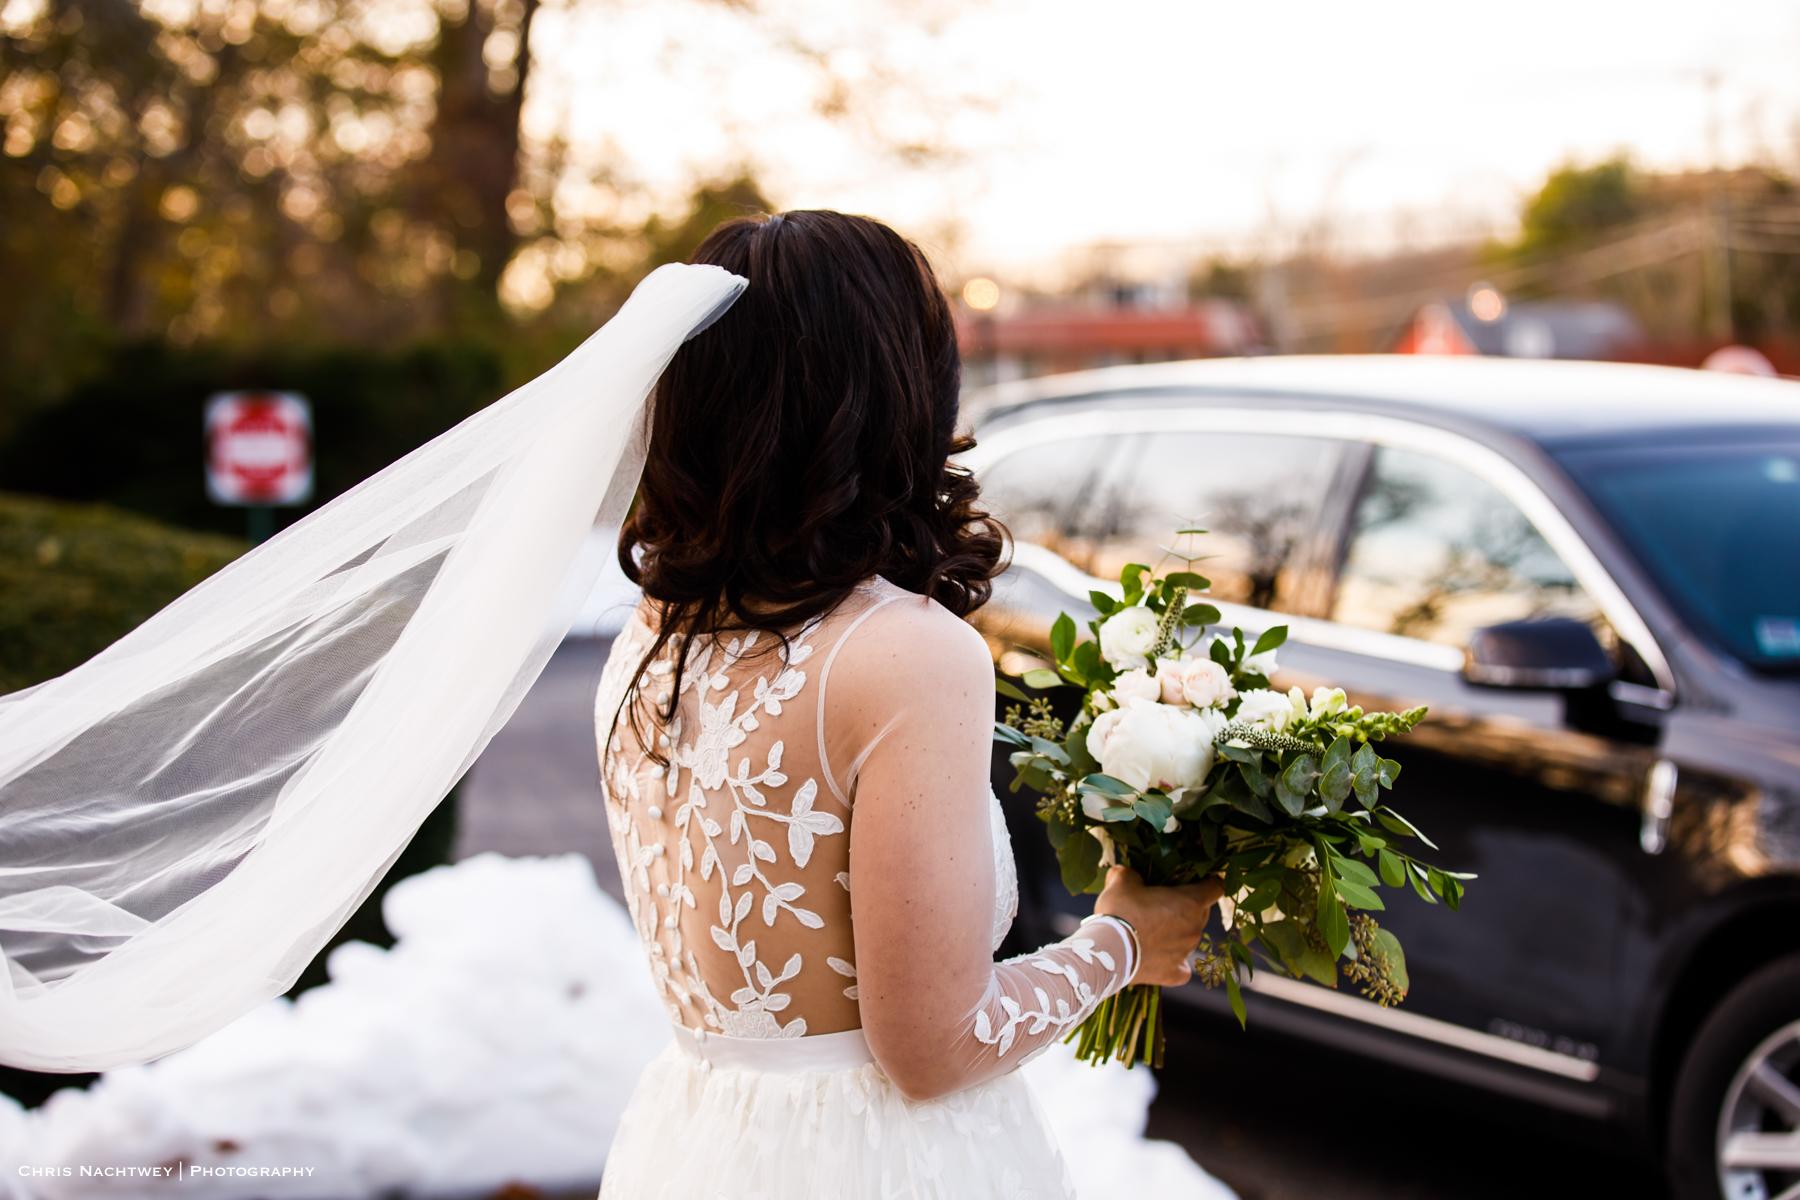 winter-branford-house-wedding-photos-groton-ct-chris-nachtwey-photography-2019-19.jpg